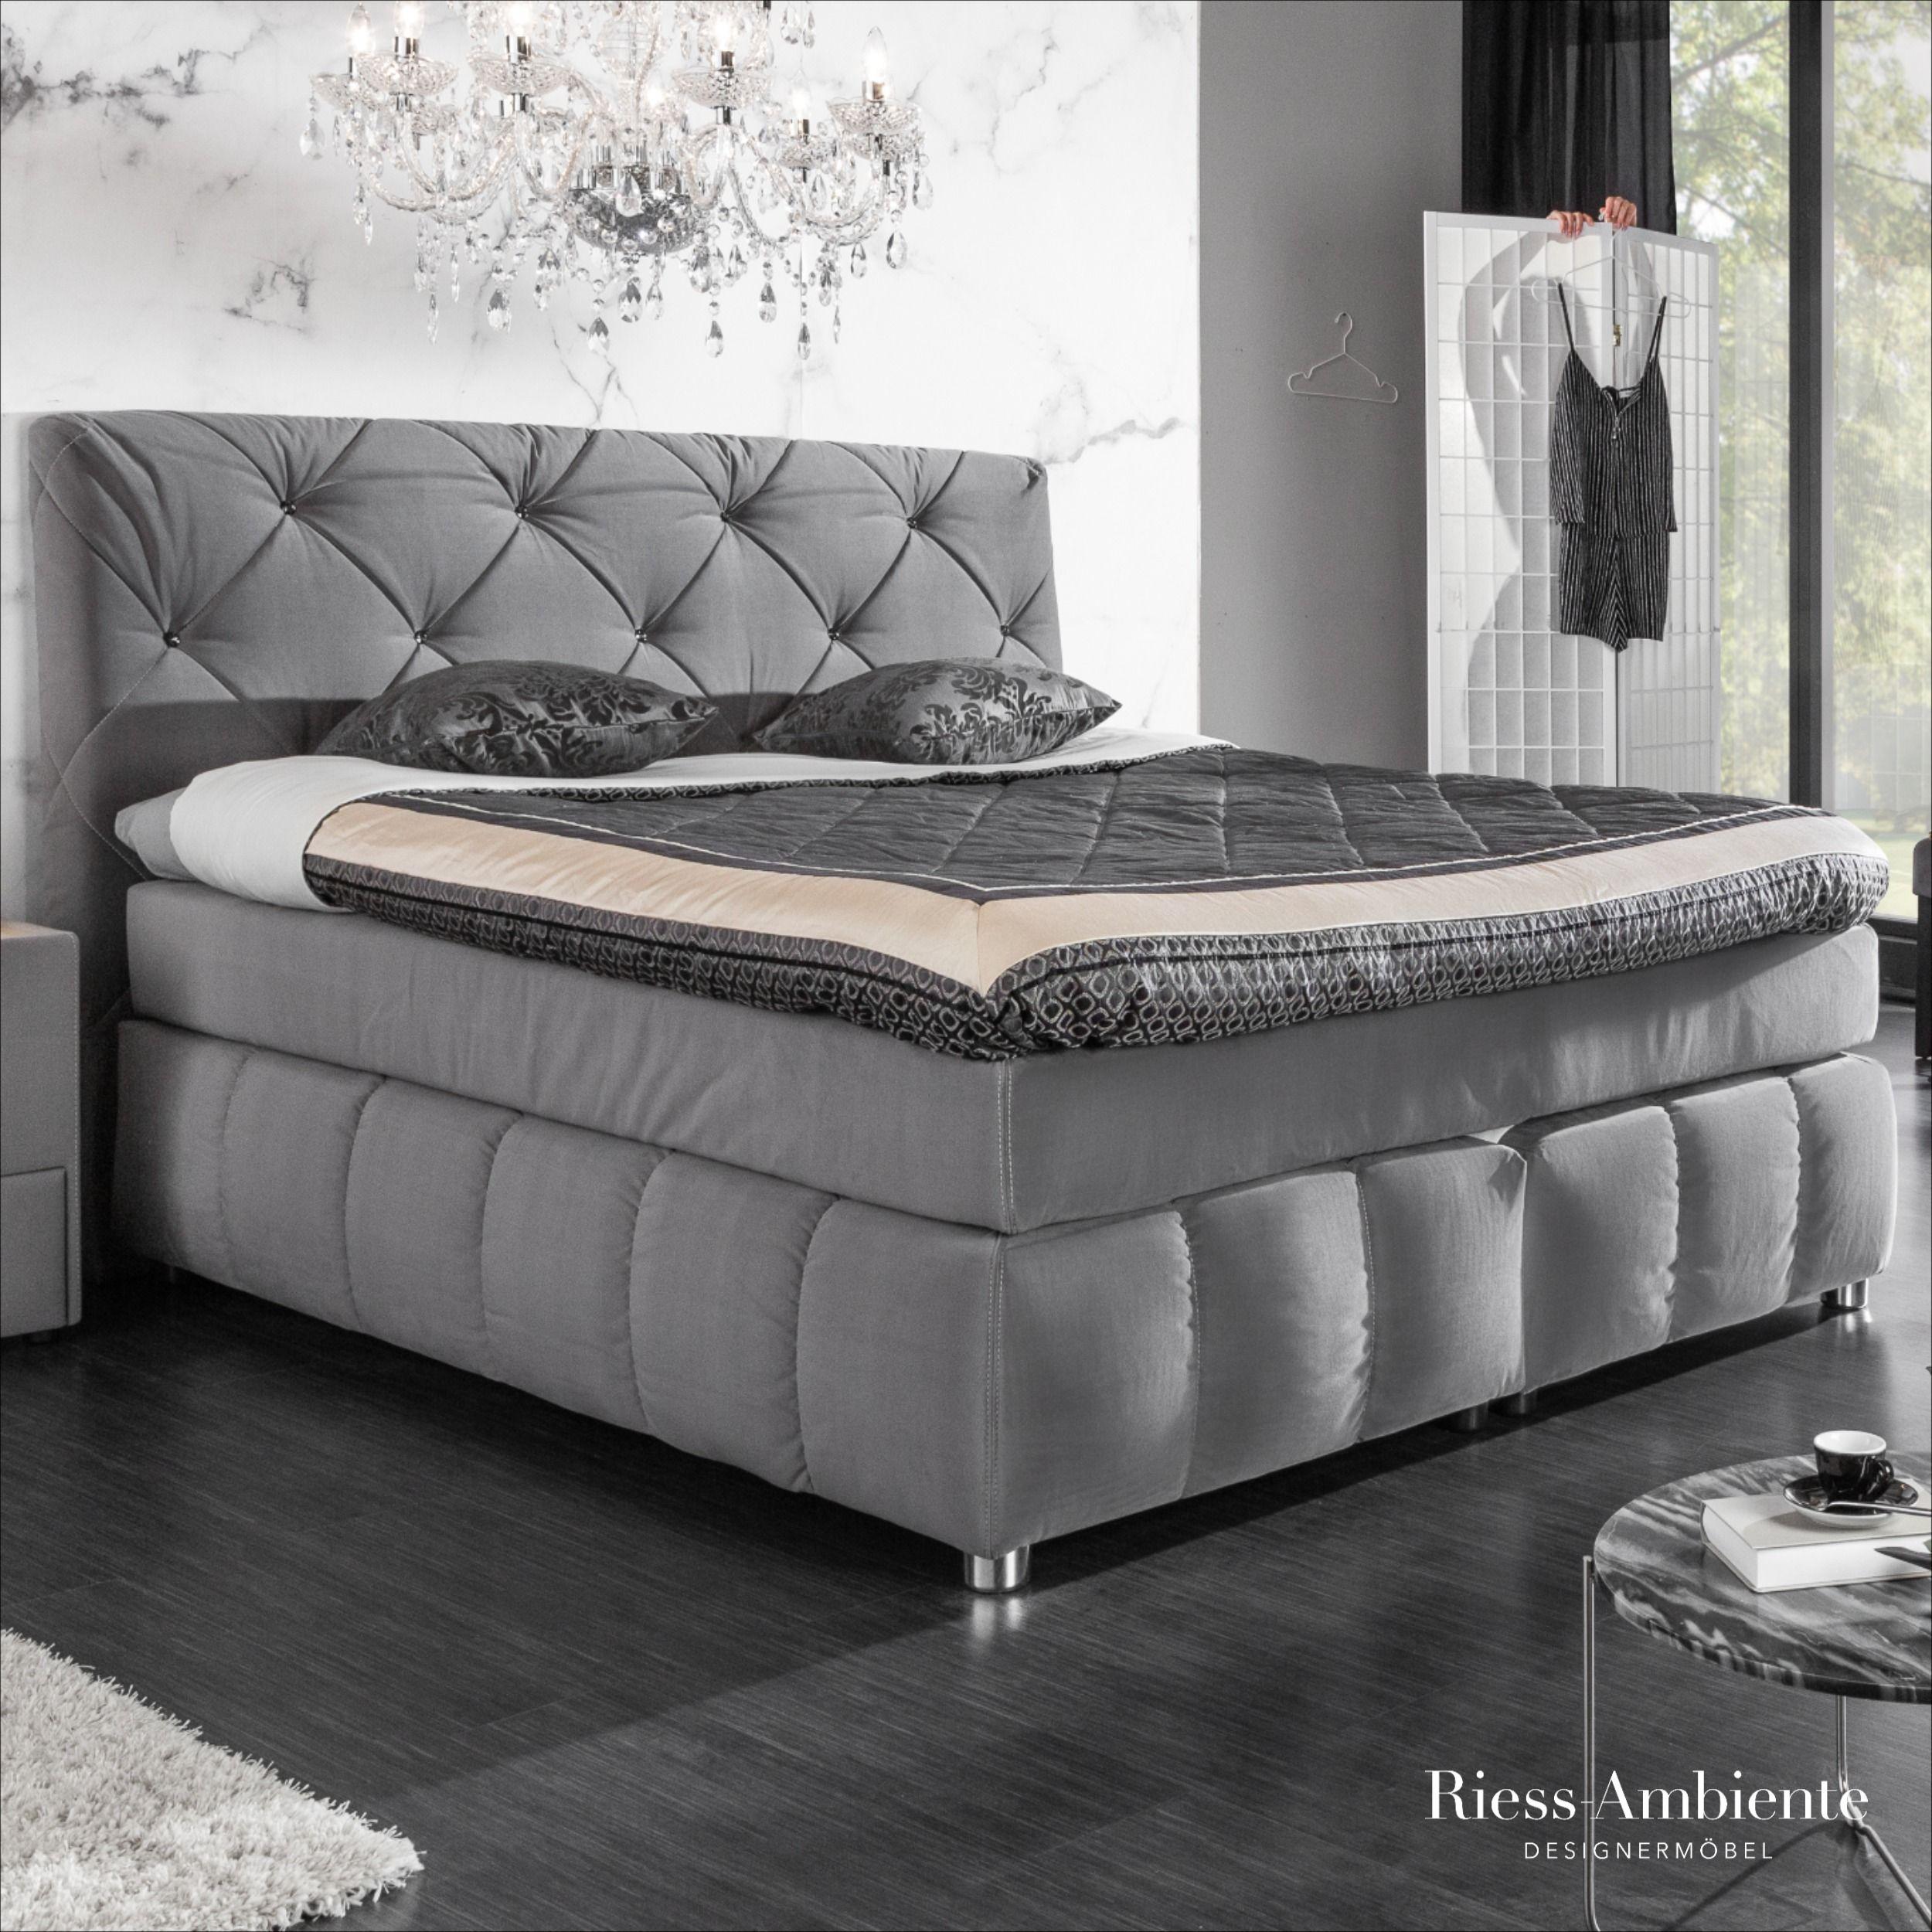 Boxspringbett 180cm Grau Samt Riess Ambiente De Bett Boxspringbett Schickes Schlafzimmer